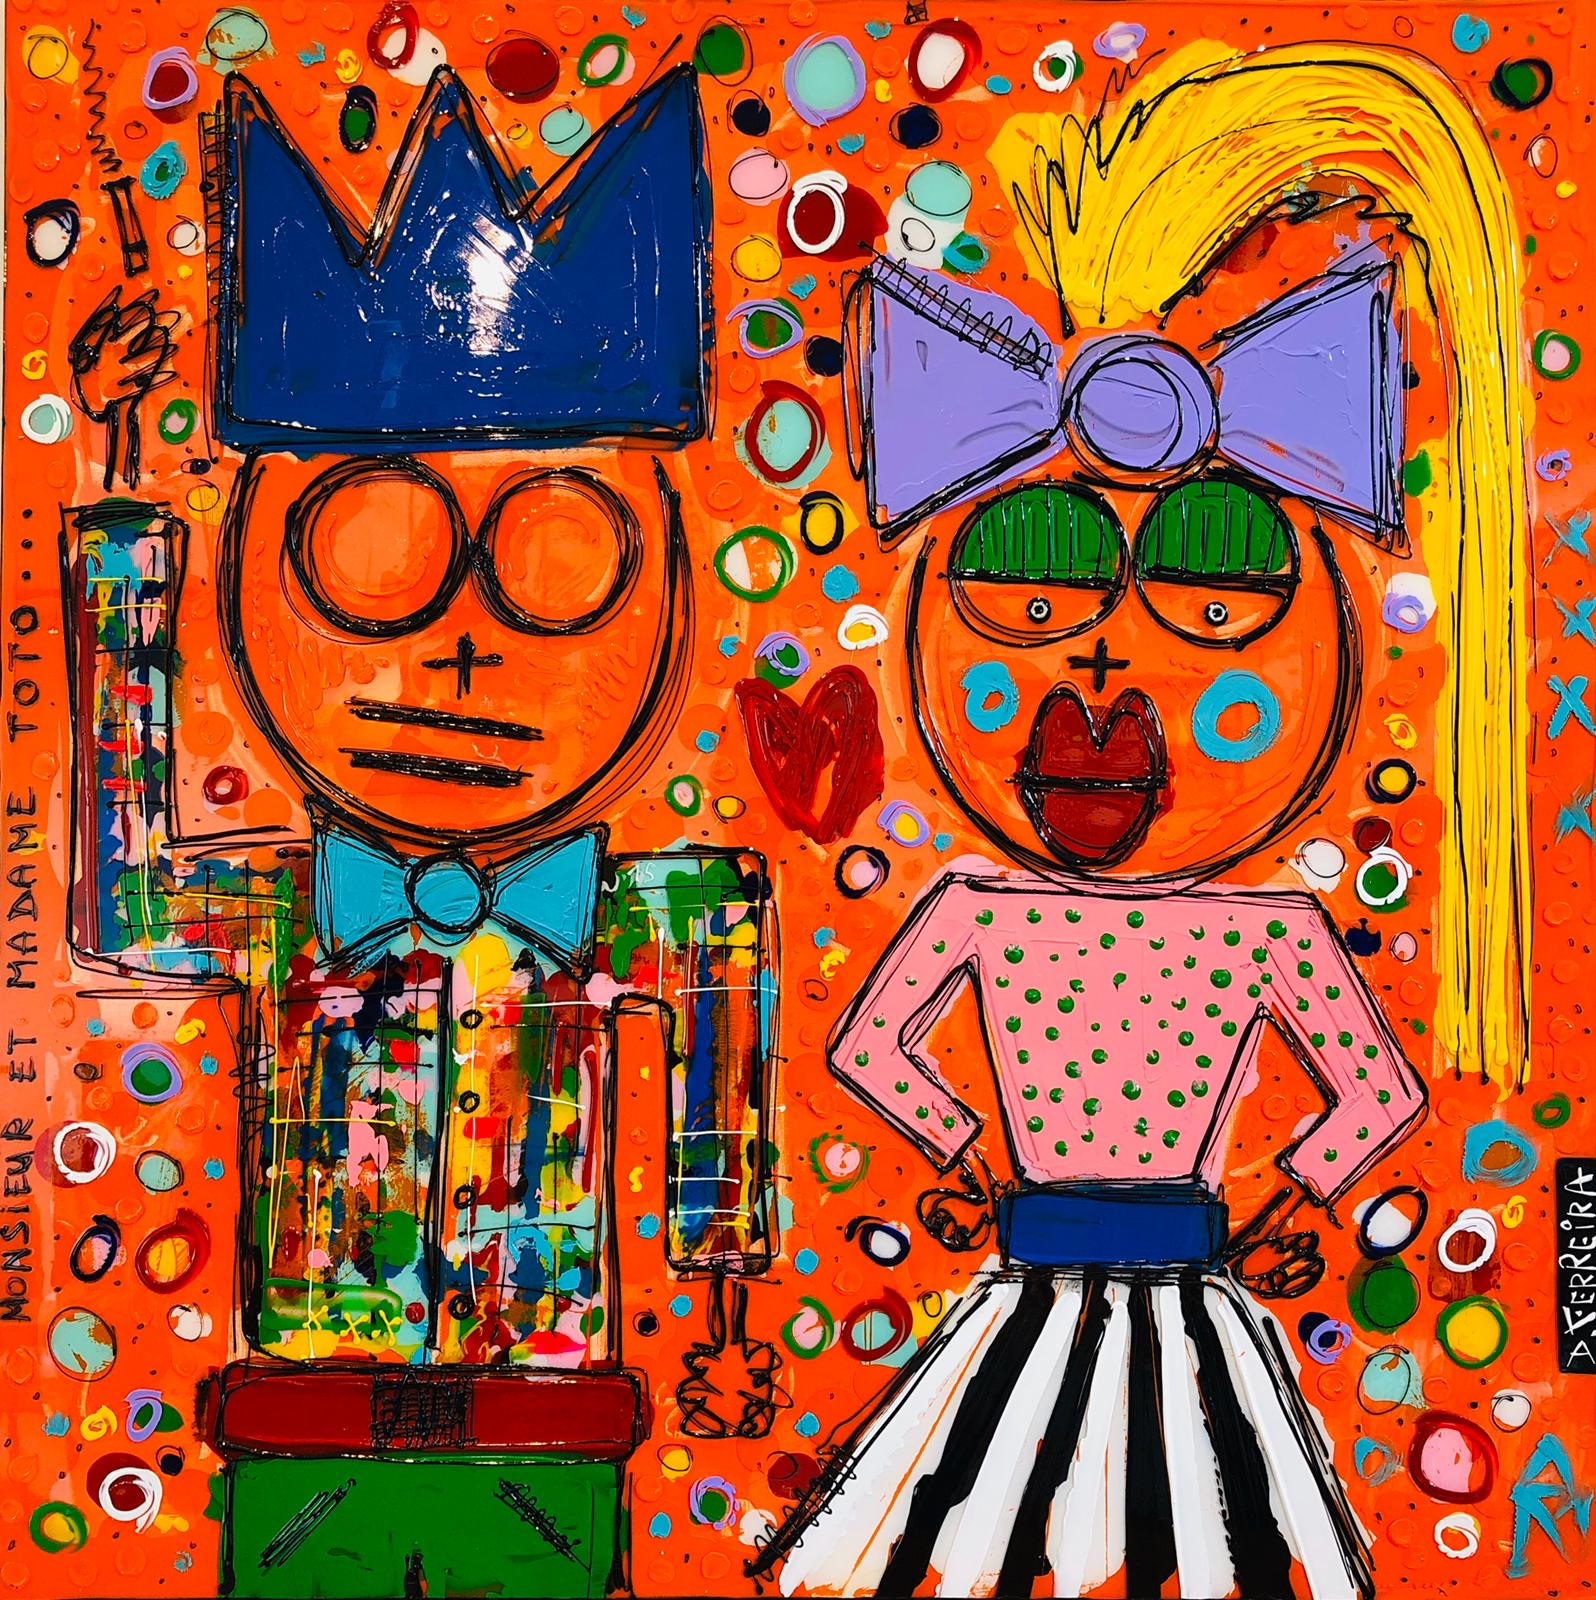 Monsieur et Madame Toto